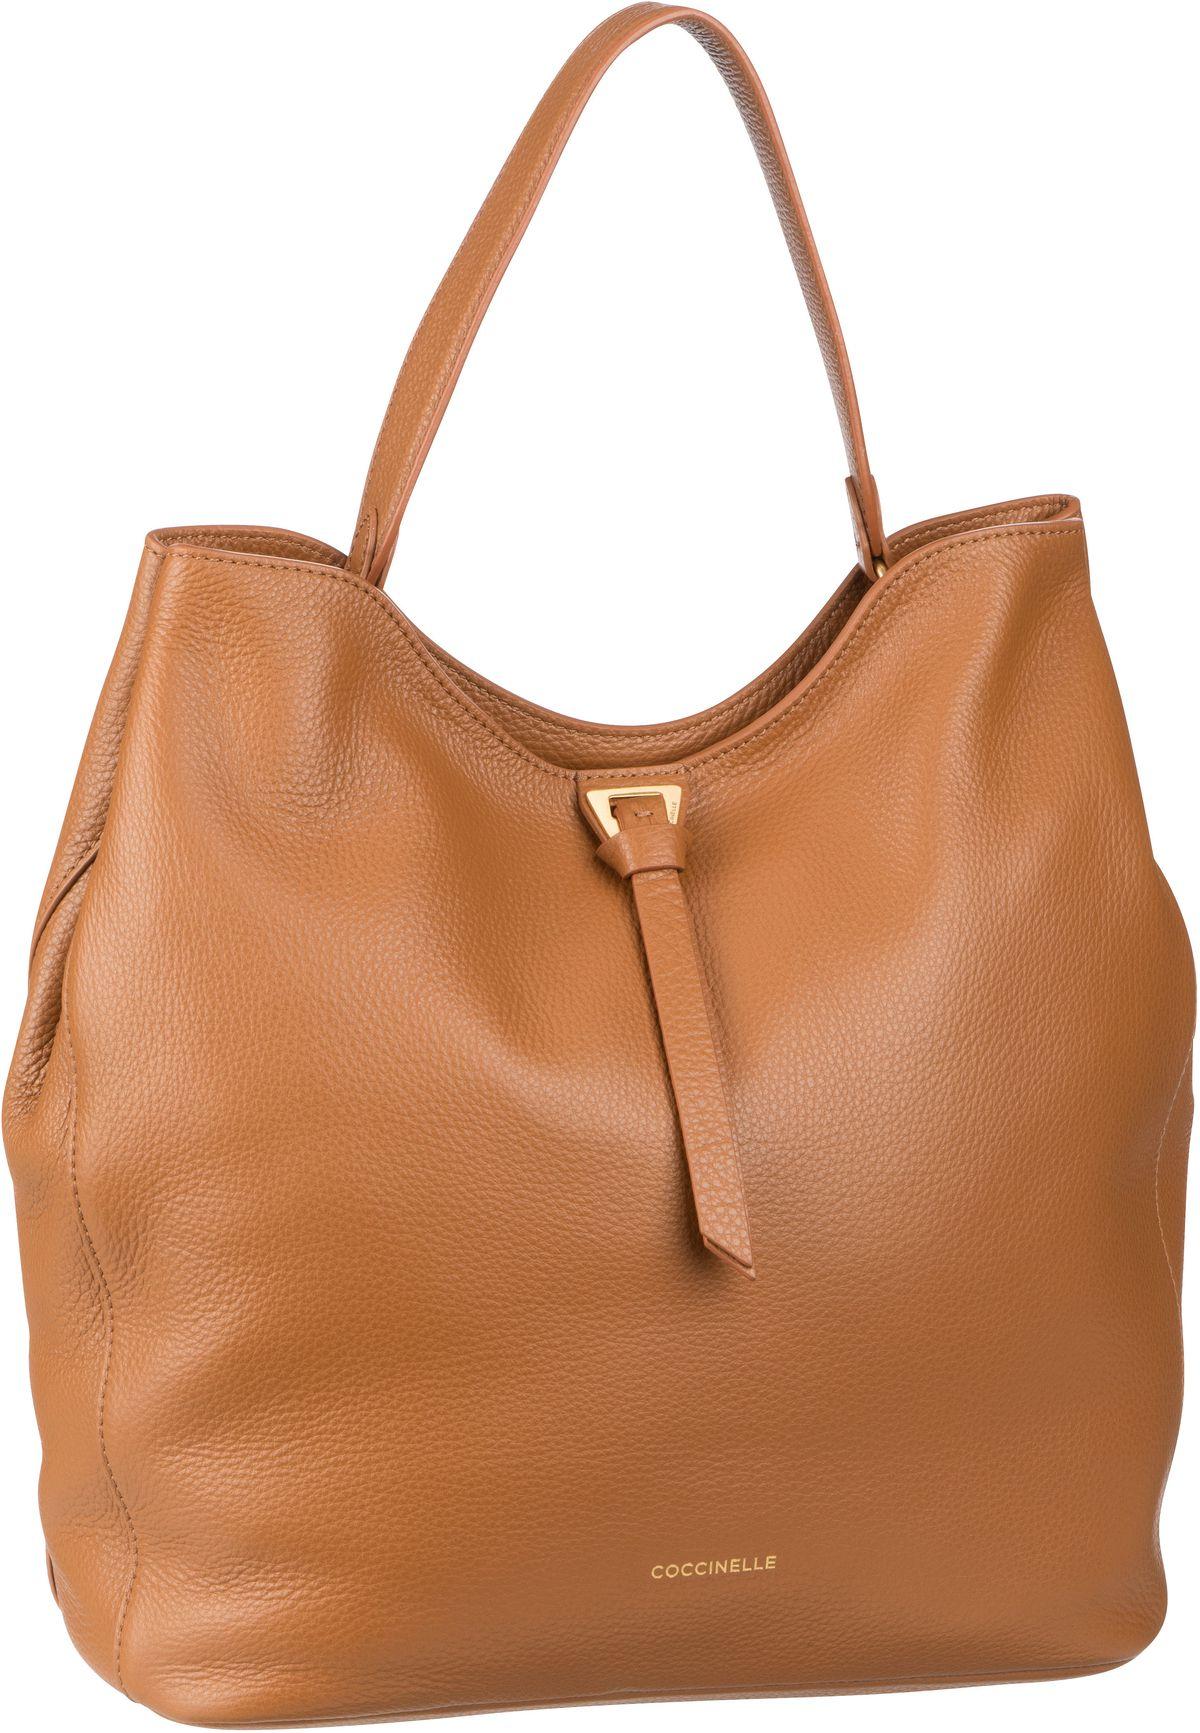 Handtasche Joyful 1301 Caramel